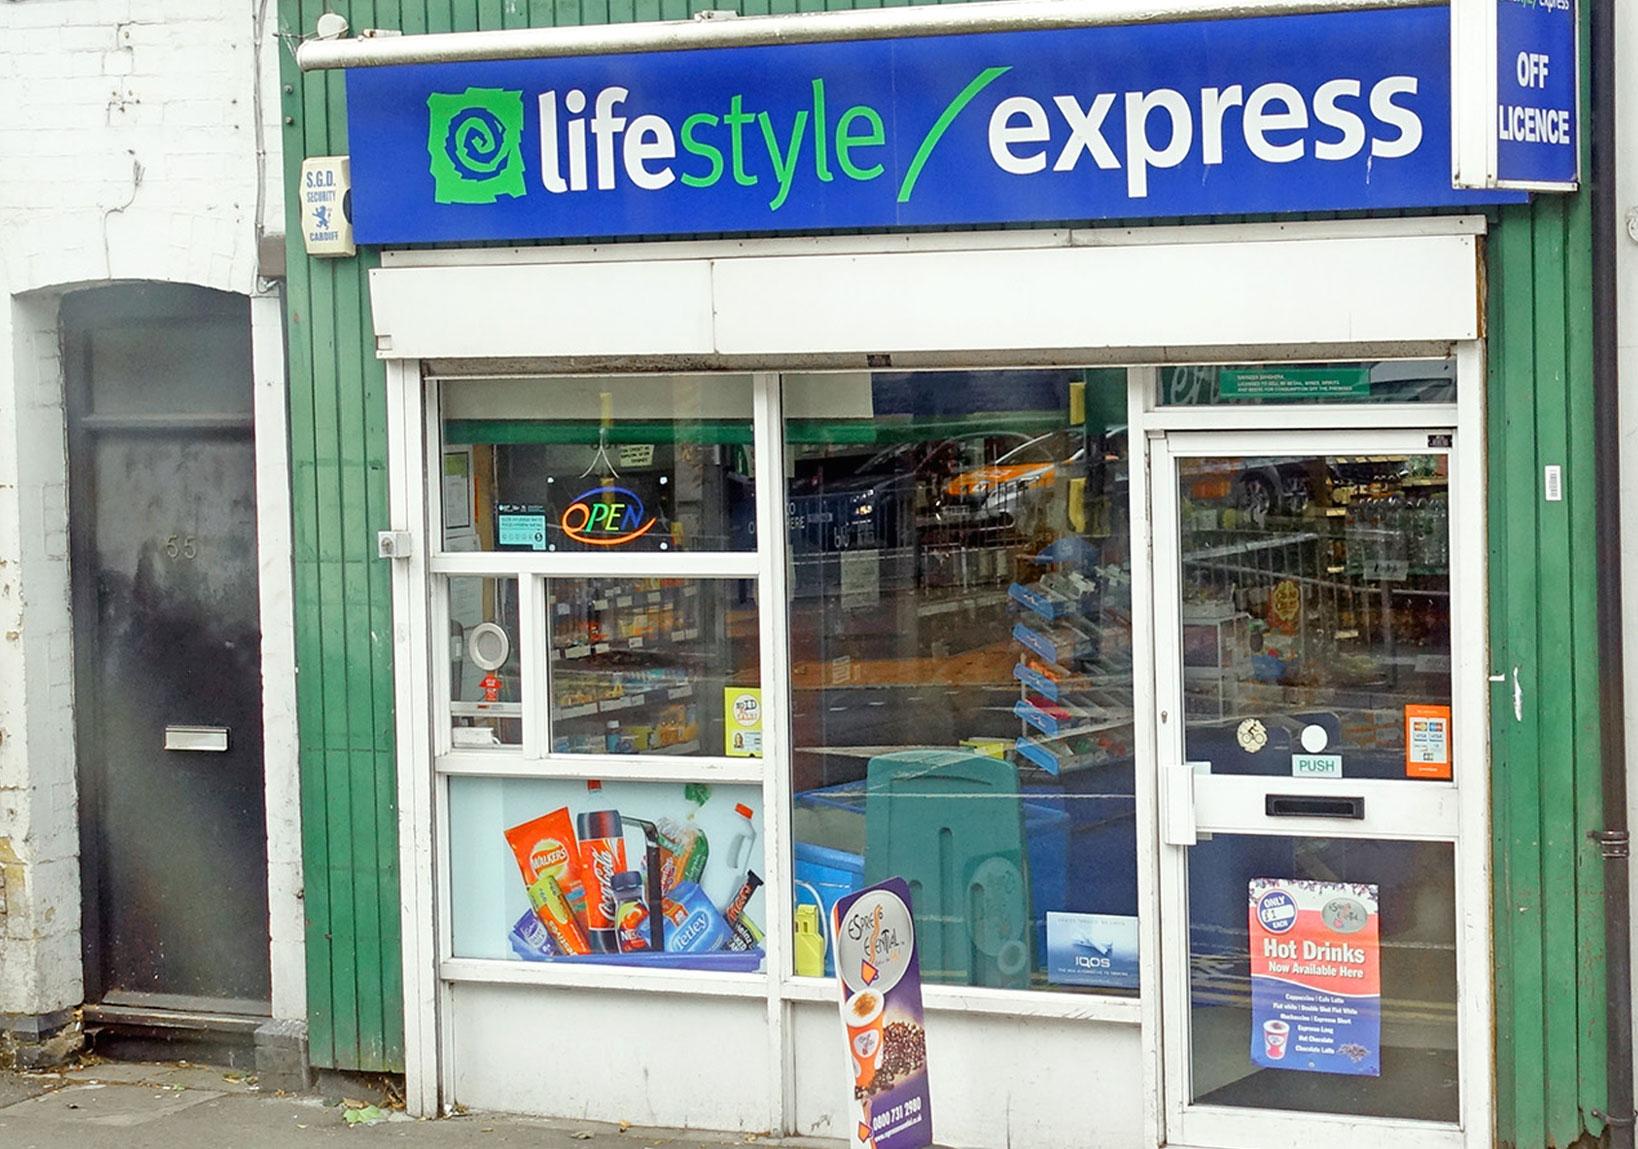 Lifestyle Express